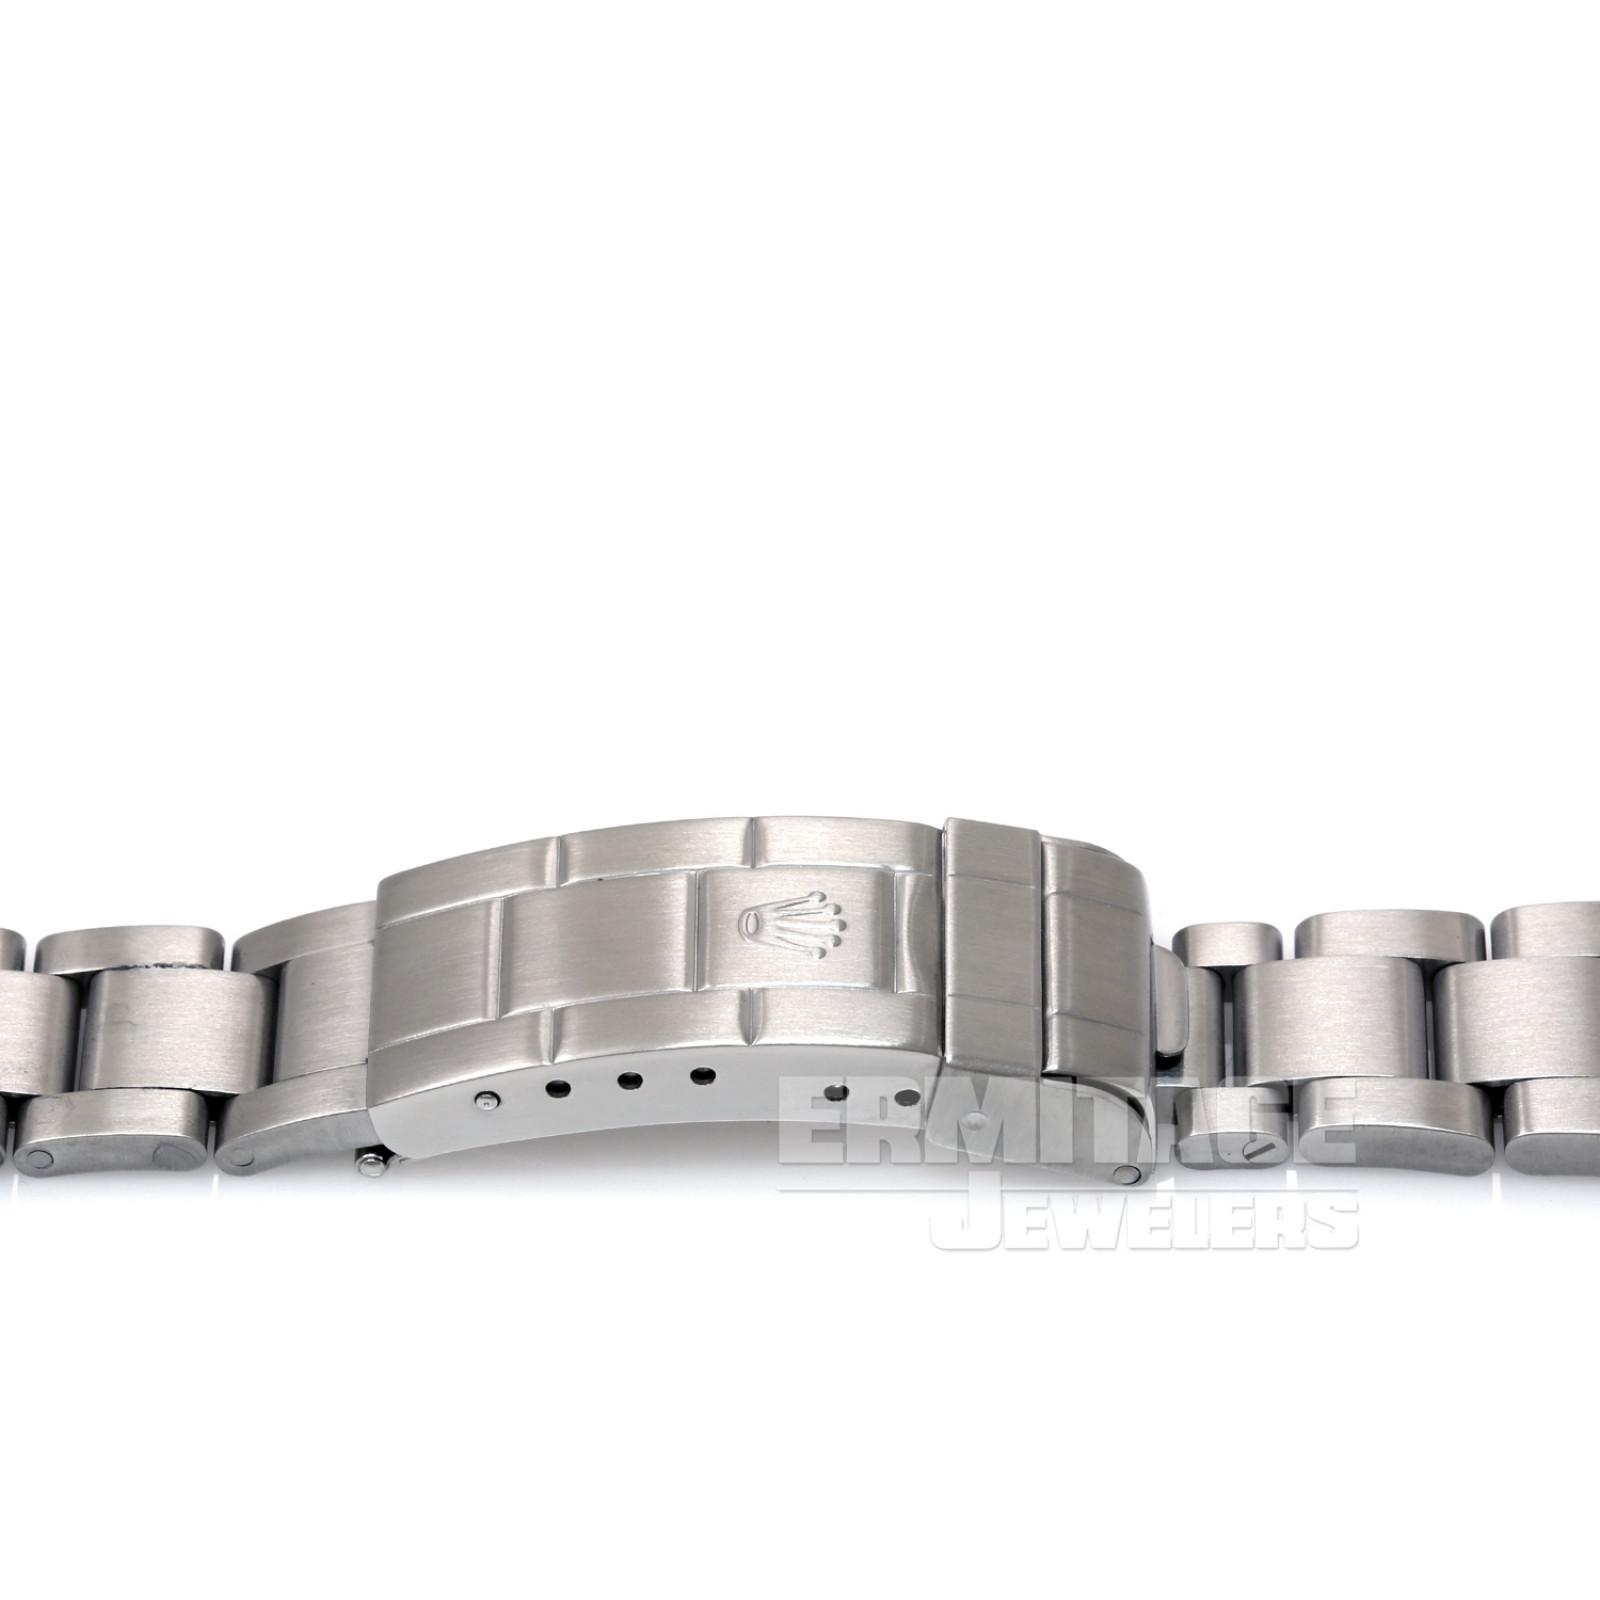 Rolex Submariner 16610 40 mm Mint Condition